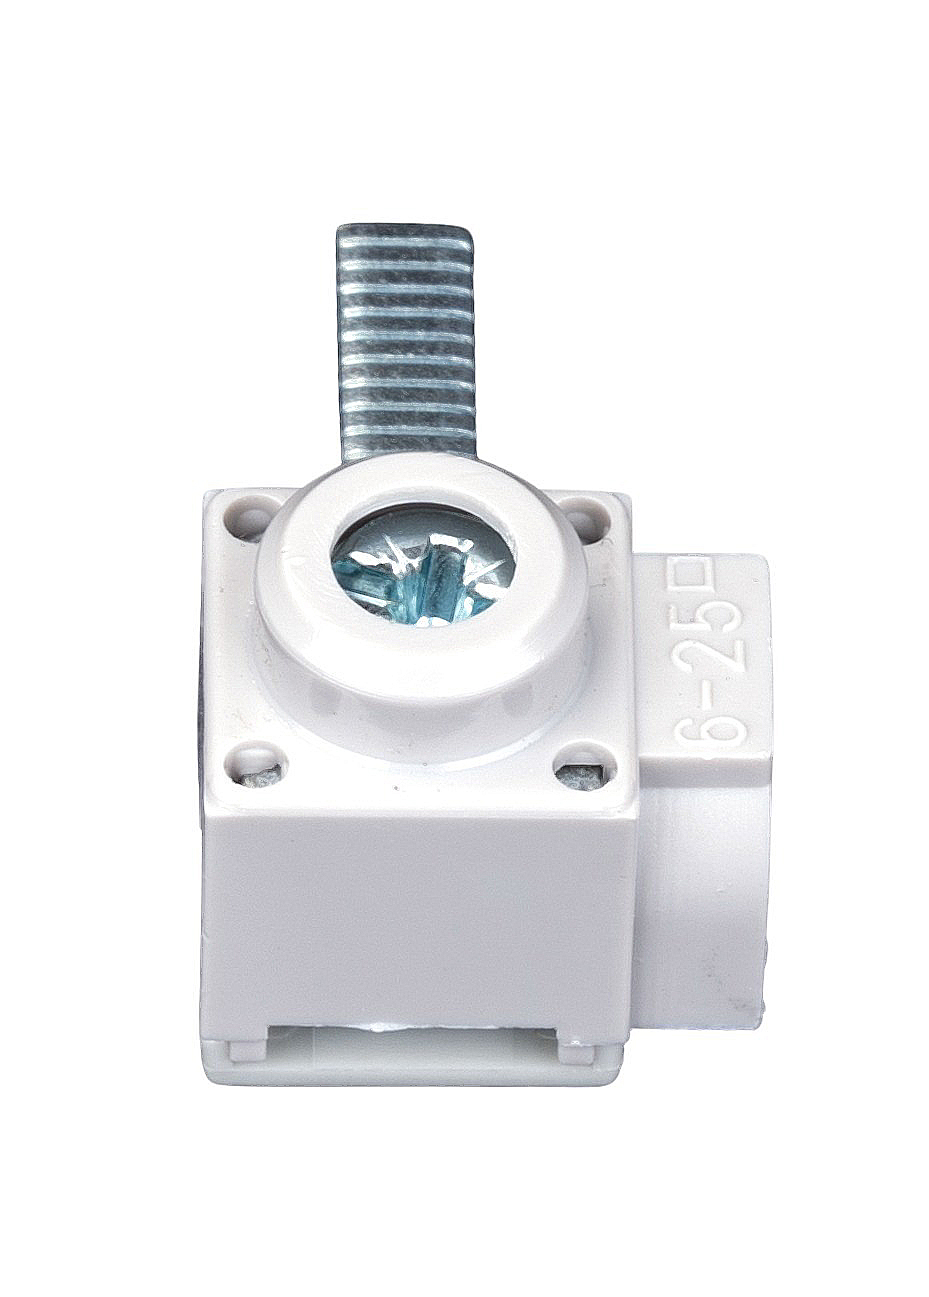 1 Stk Small Connect, Anschlußklemme für 1+N/LS 1TE, verzinkt BS990172--